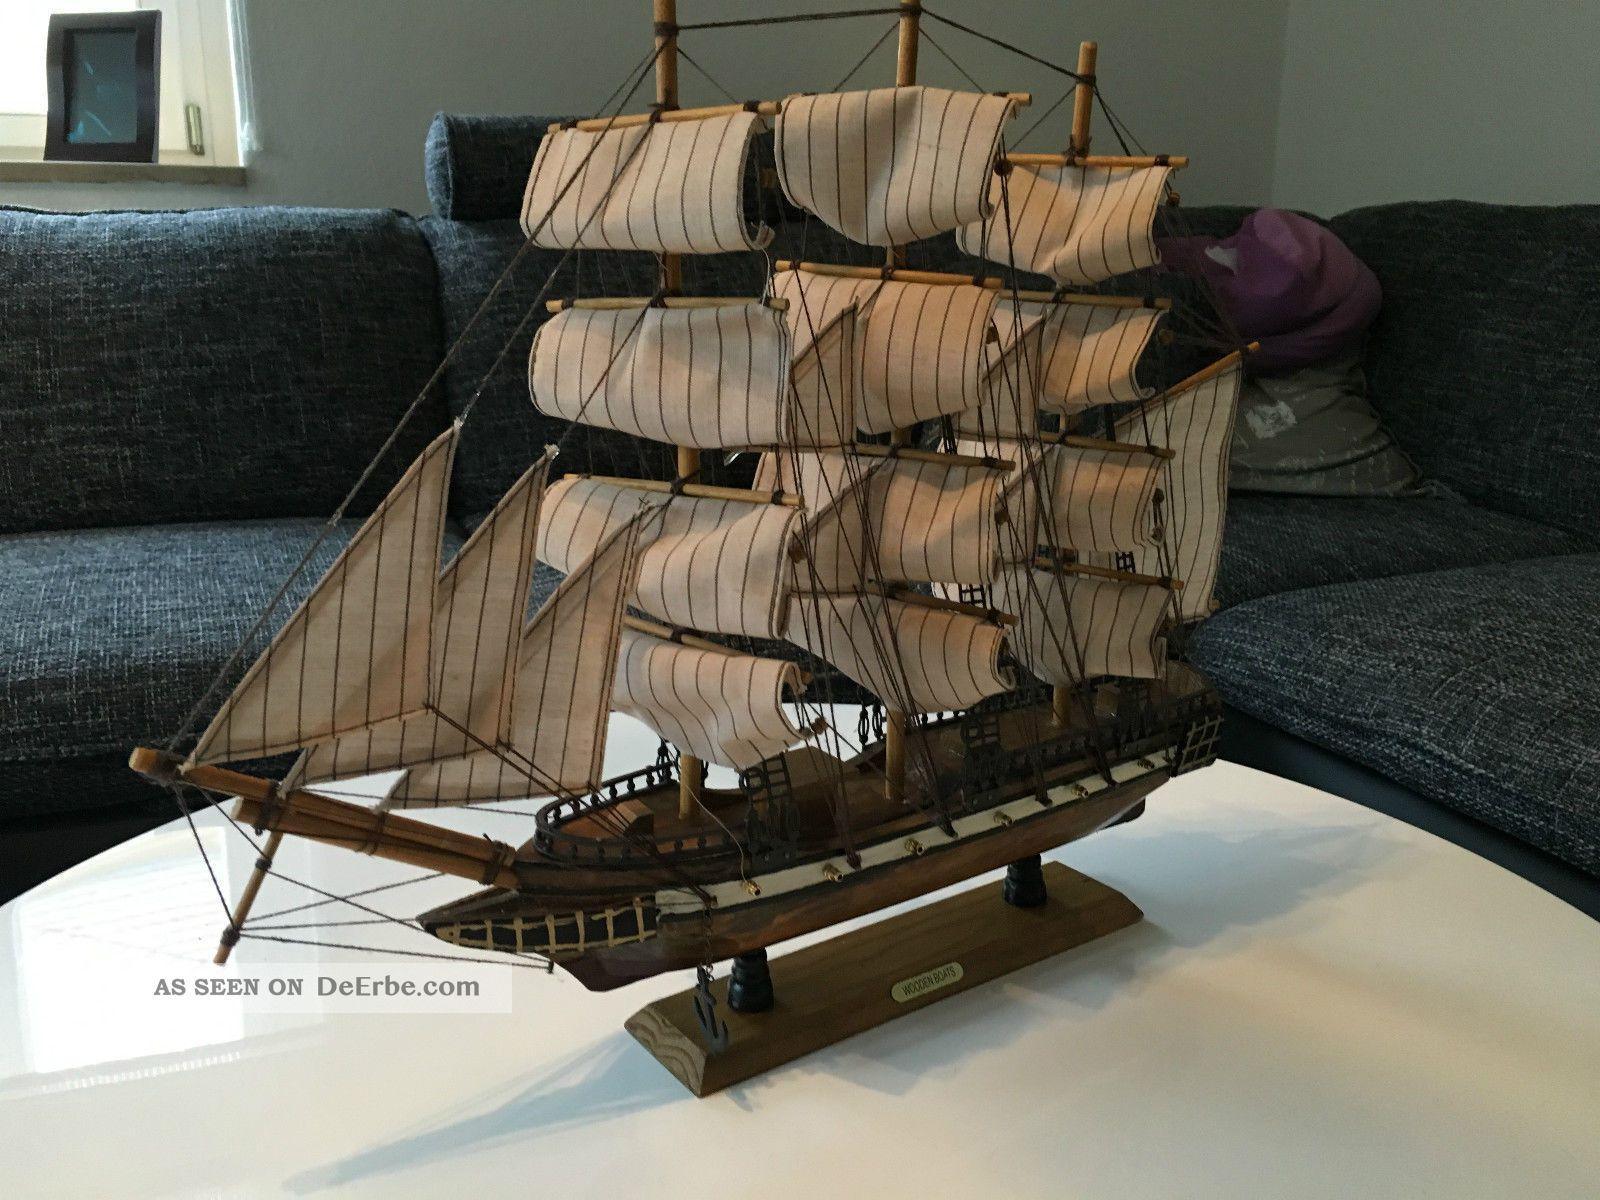 Segelschiff Fragatte 3 Master,  12 Kanonen - Modell Maritime Dekoration Bild